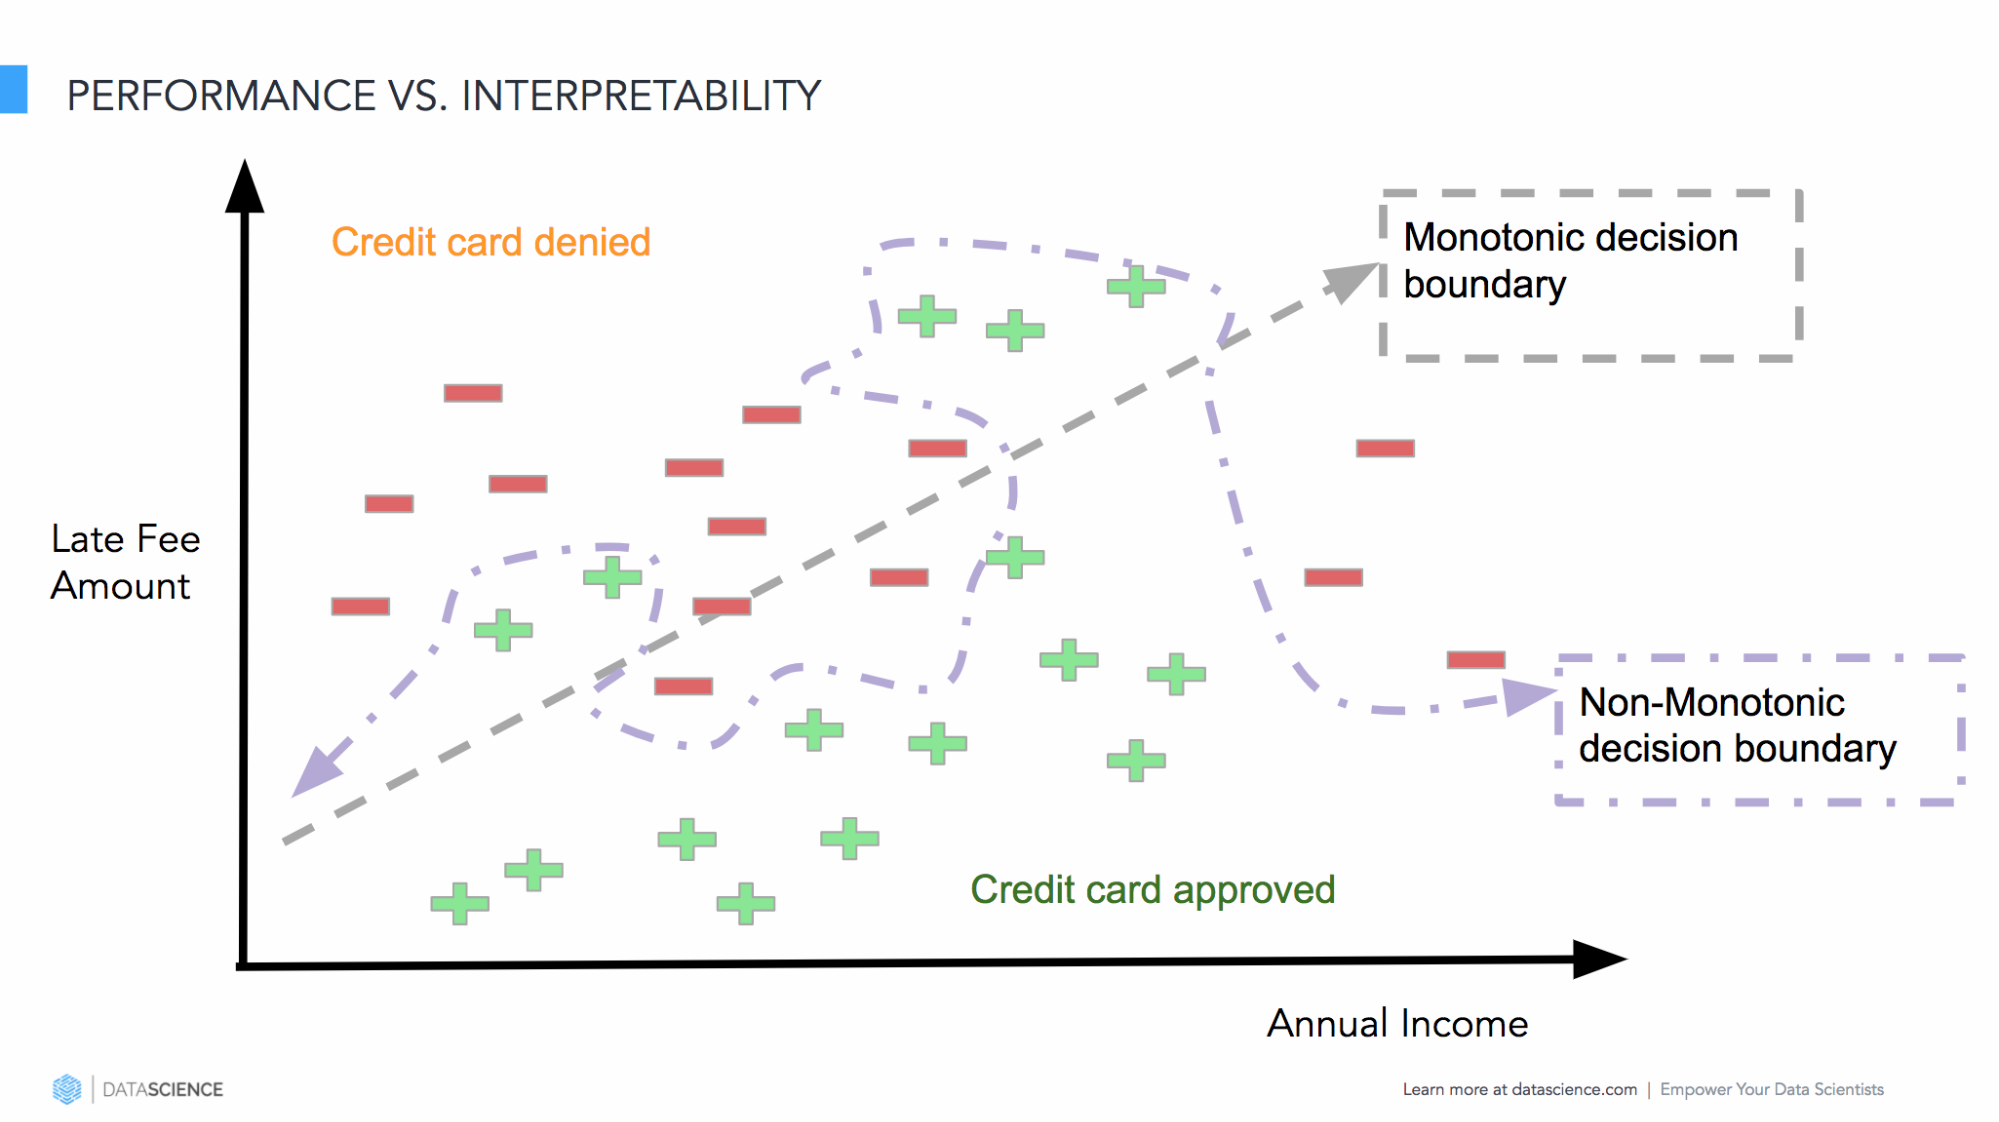 Model performance versus interpretability